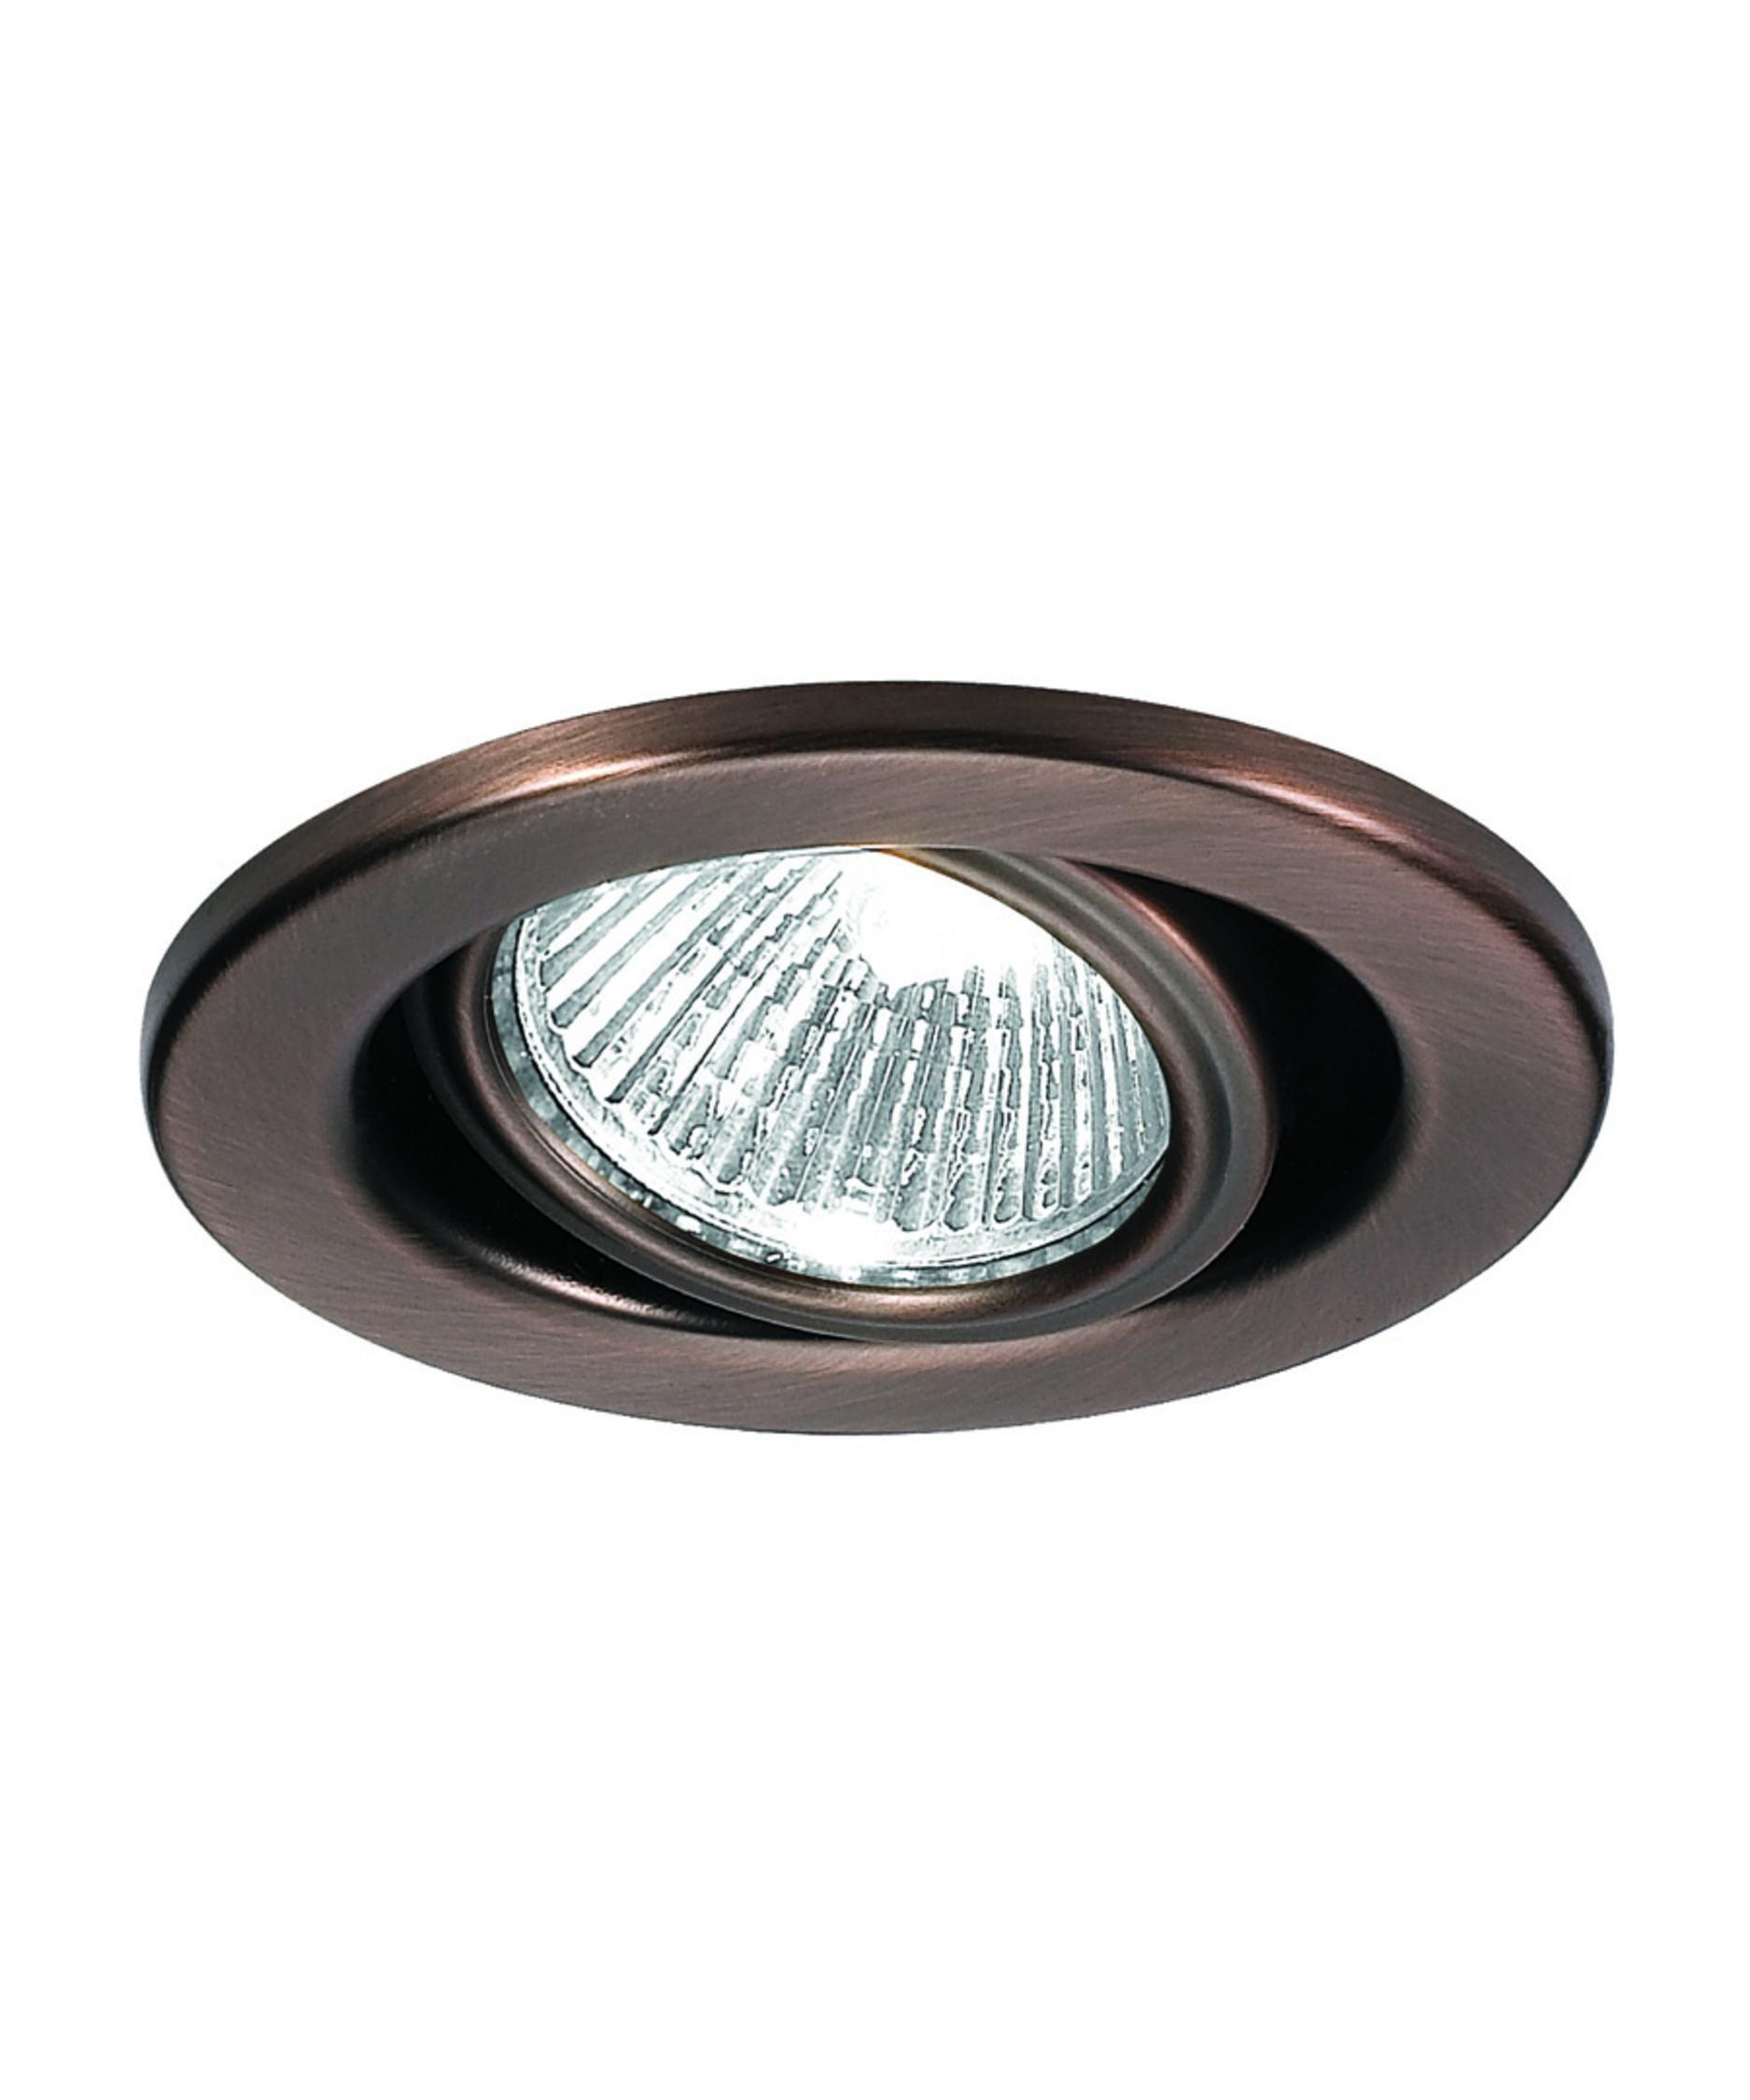 Wac lighting hr 837 recessed lighting trim family room pinterest wac lighting hr 837 recessed lighting trim arubaitofo Image collections